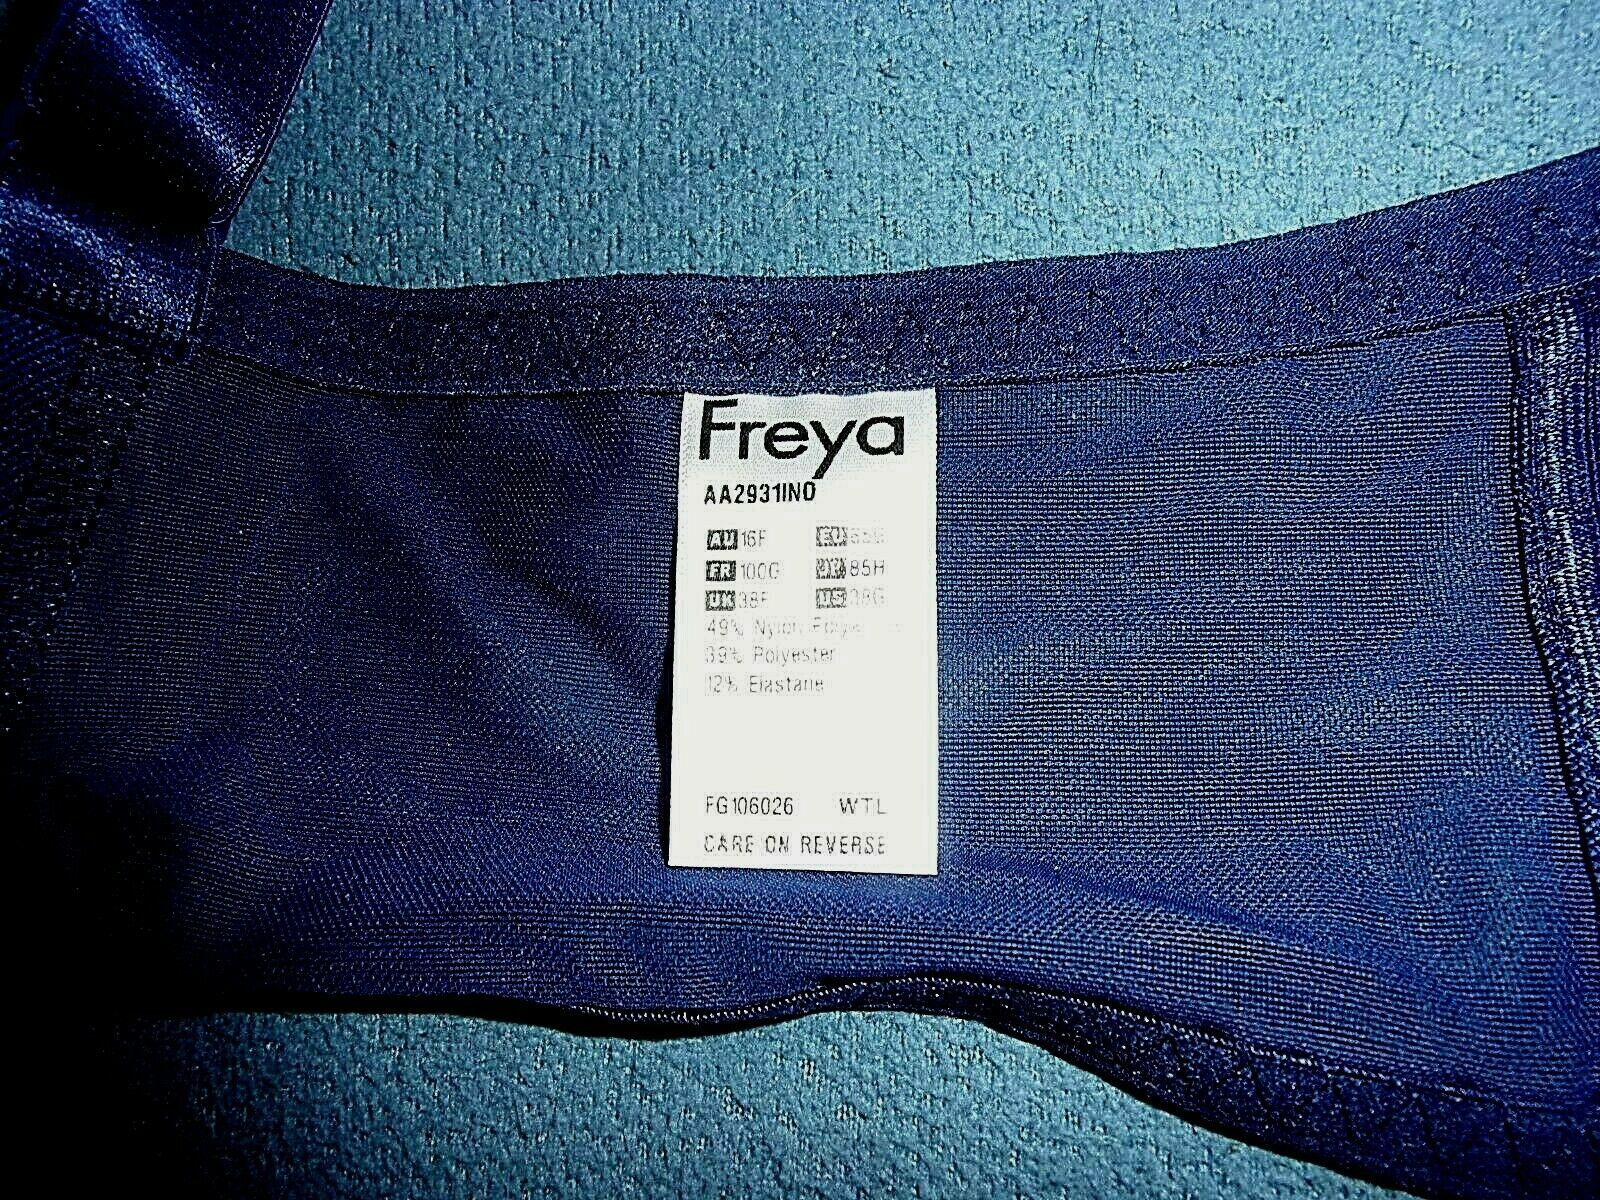 Freya Cosmic Underwire Balcony Bra AA2931